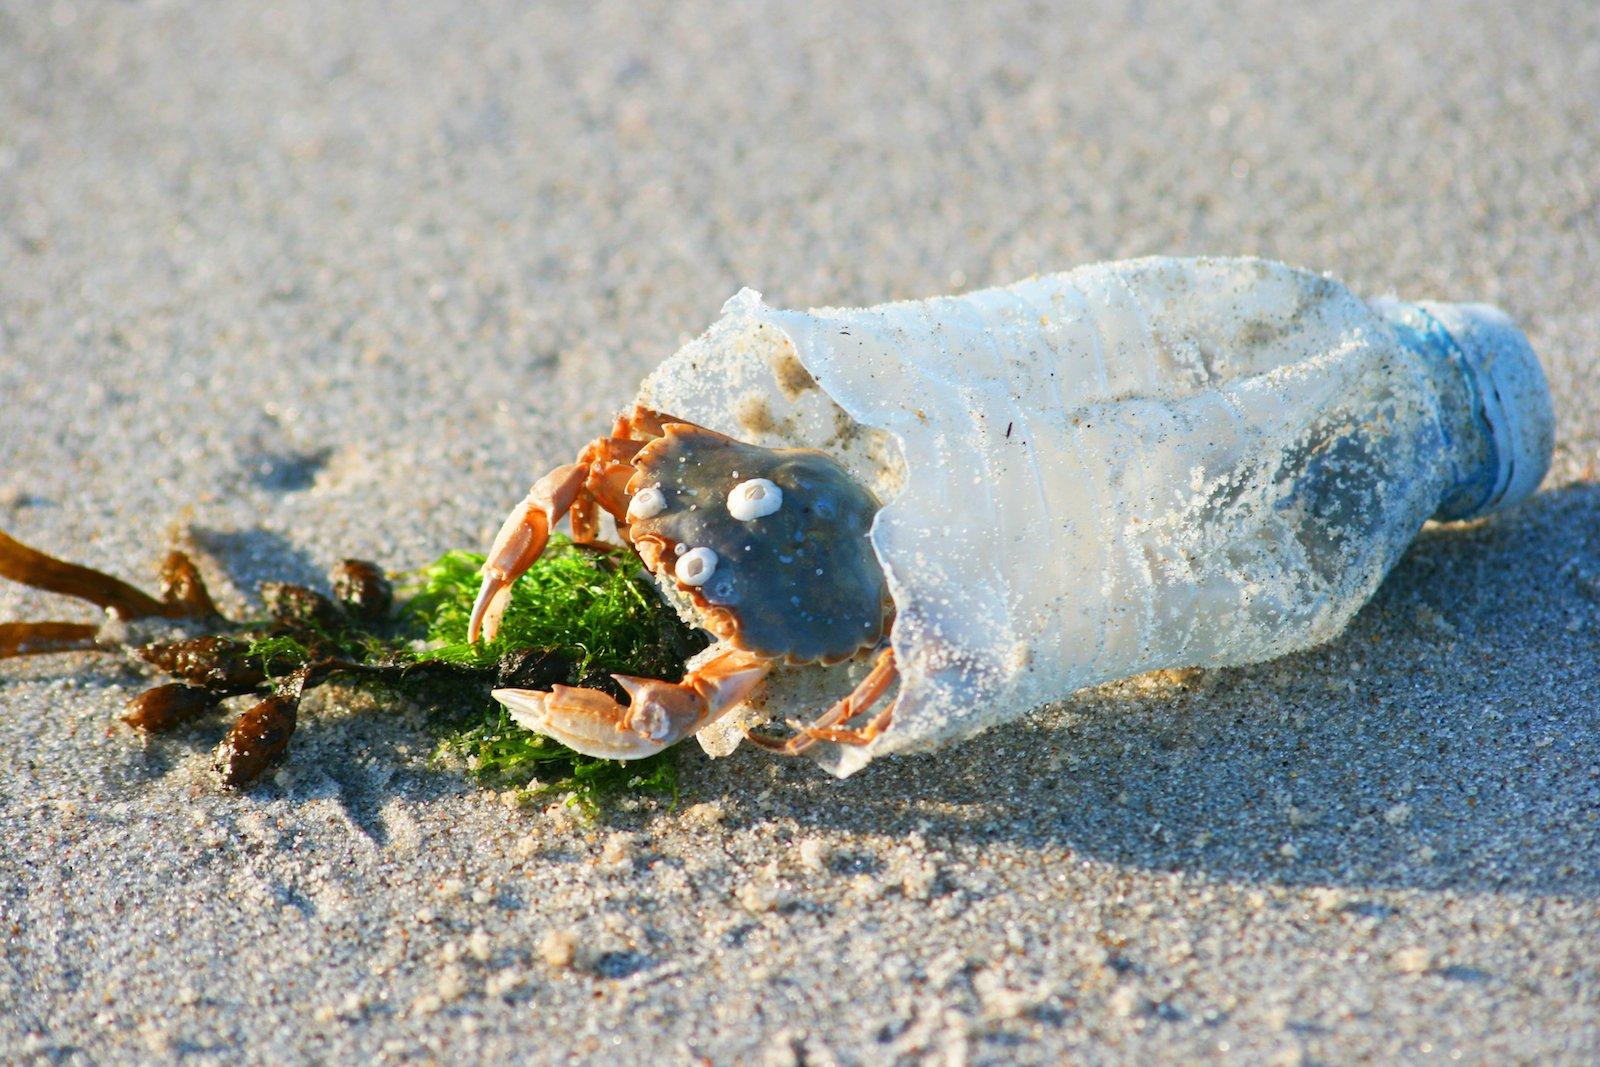 Kunststoffe bedrohen zunehmend die Meeresökosysteme.